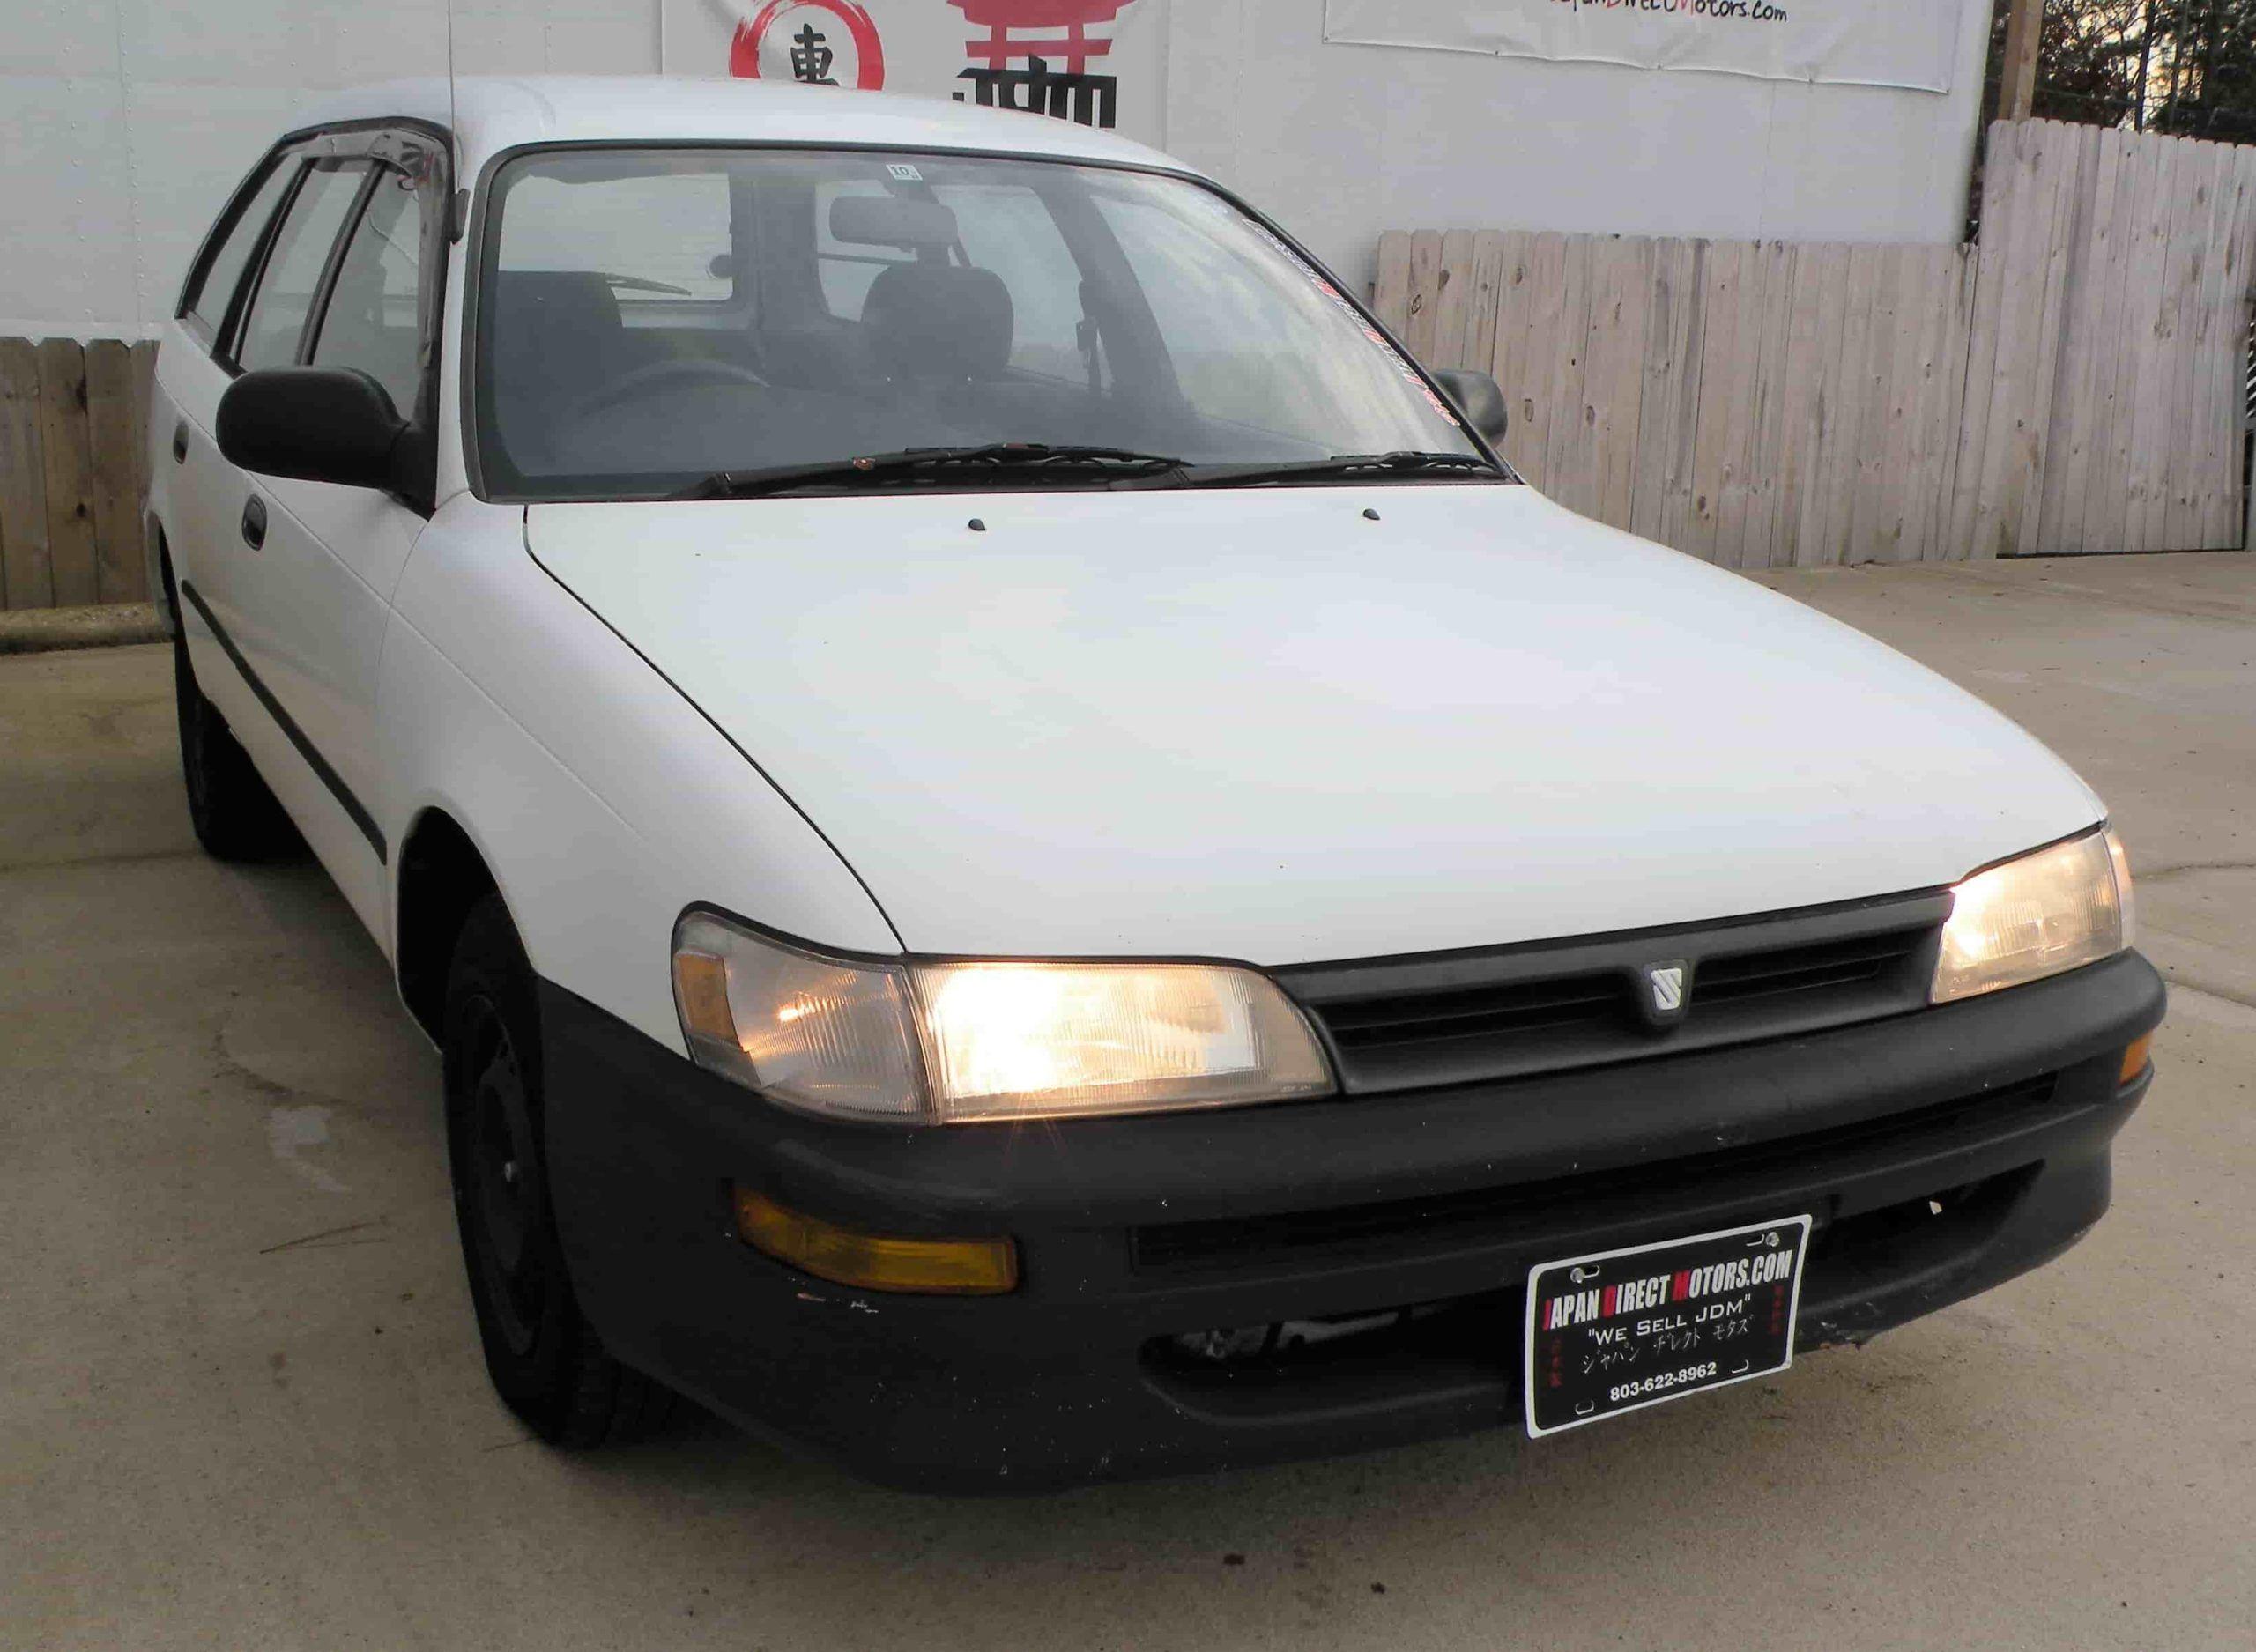 1994 Toyota Sprinter Wagon Jdmbuysell Com Wagon Toyota Sprinter